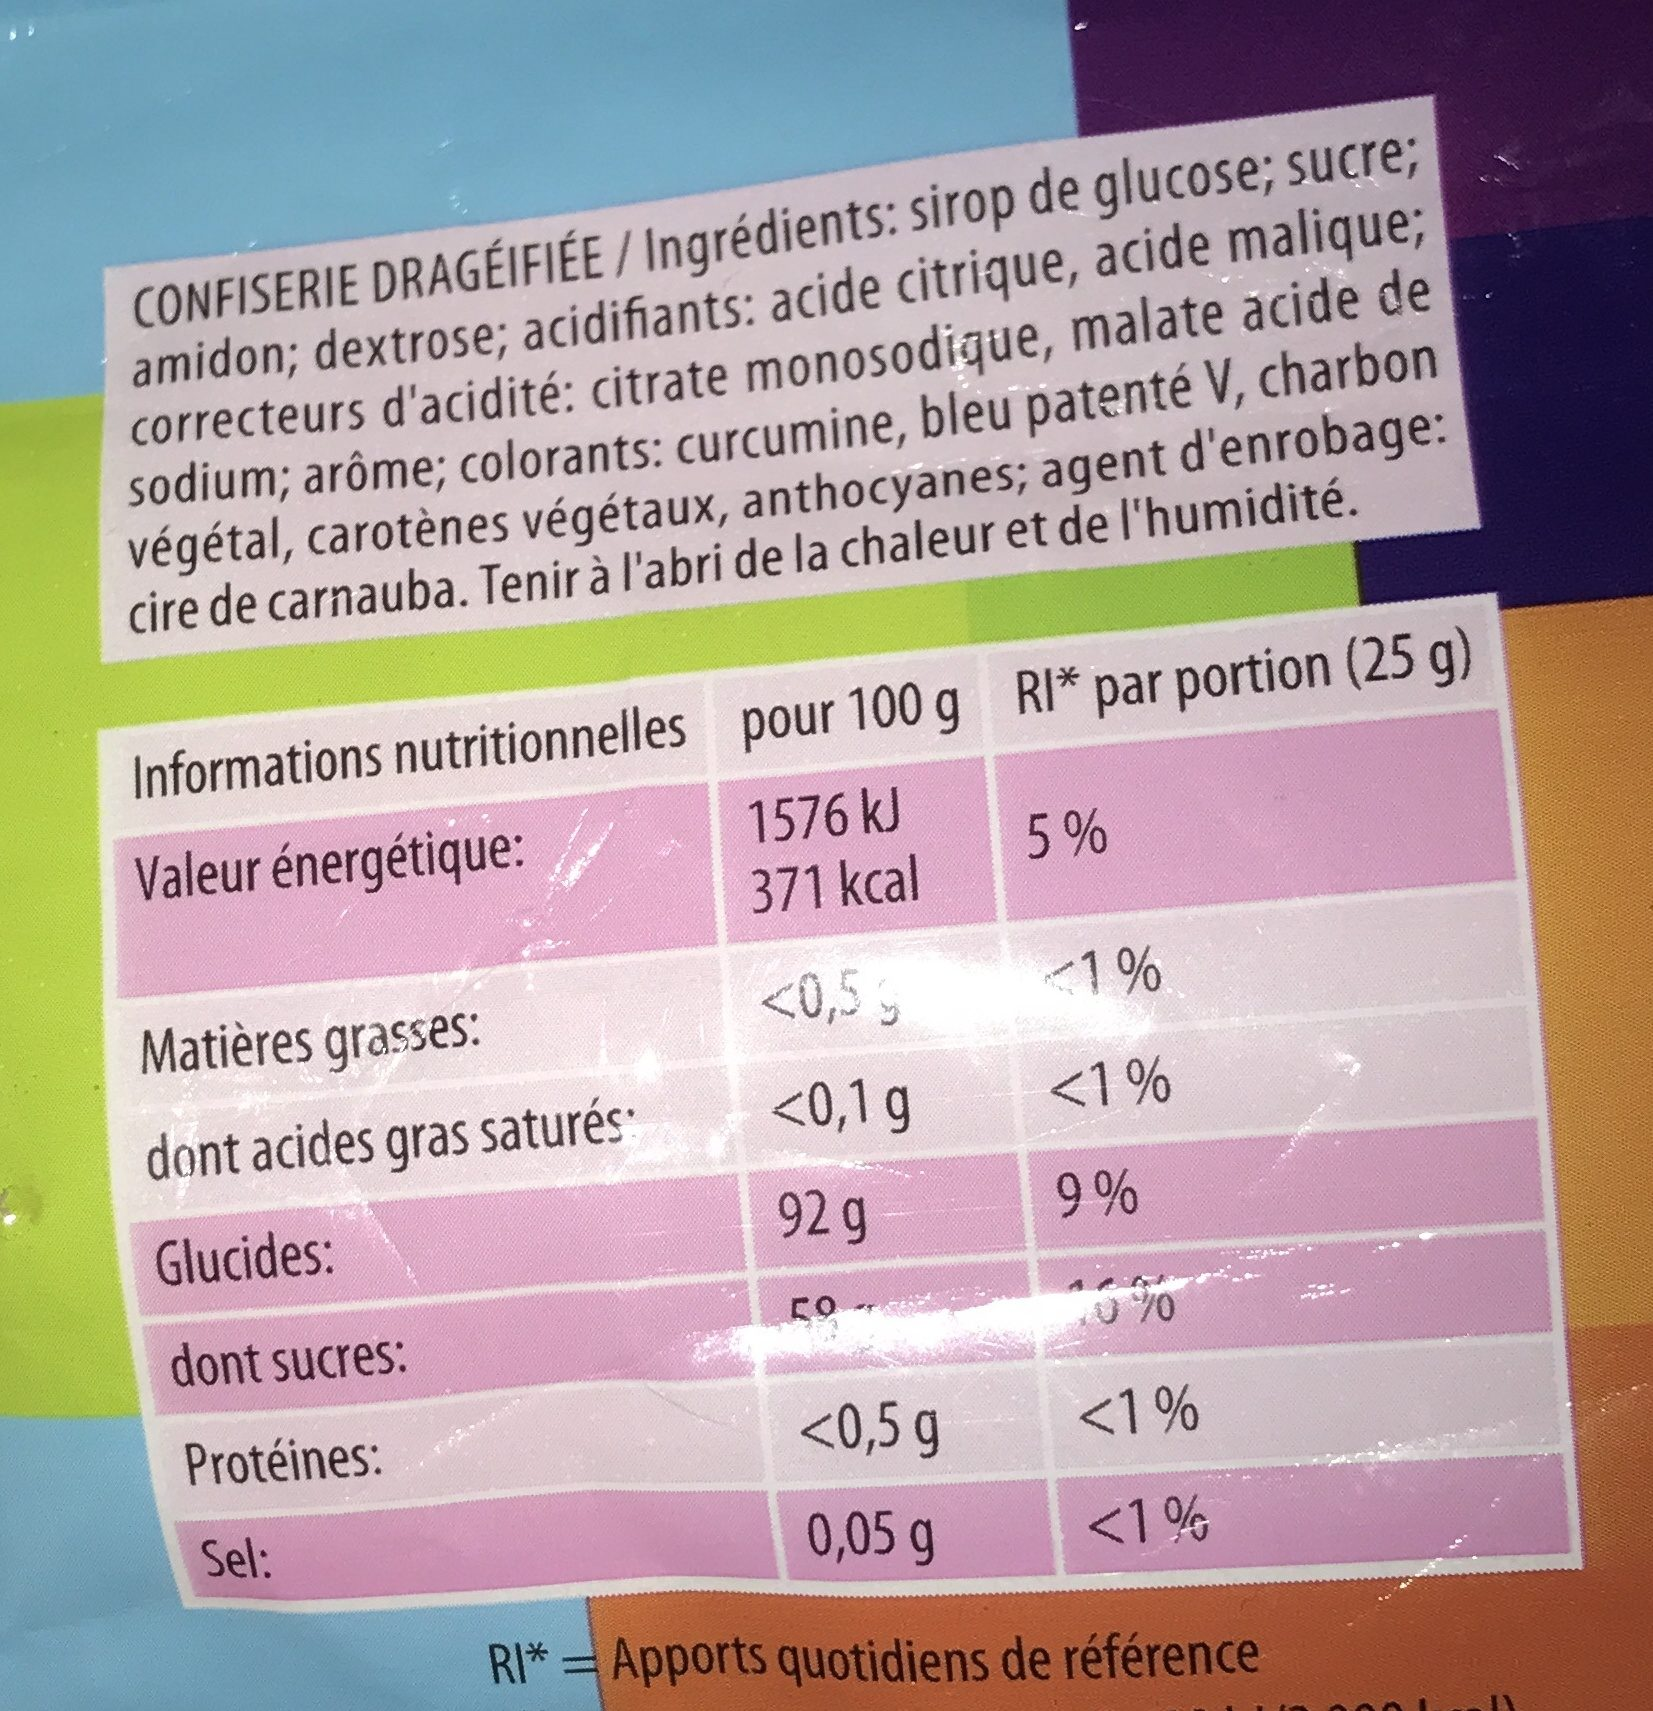 Bonbons Dragibus - Ingredients